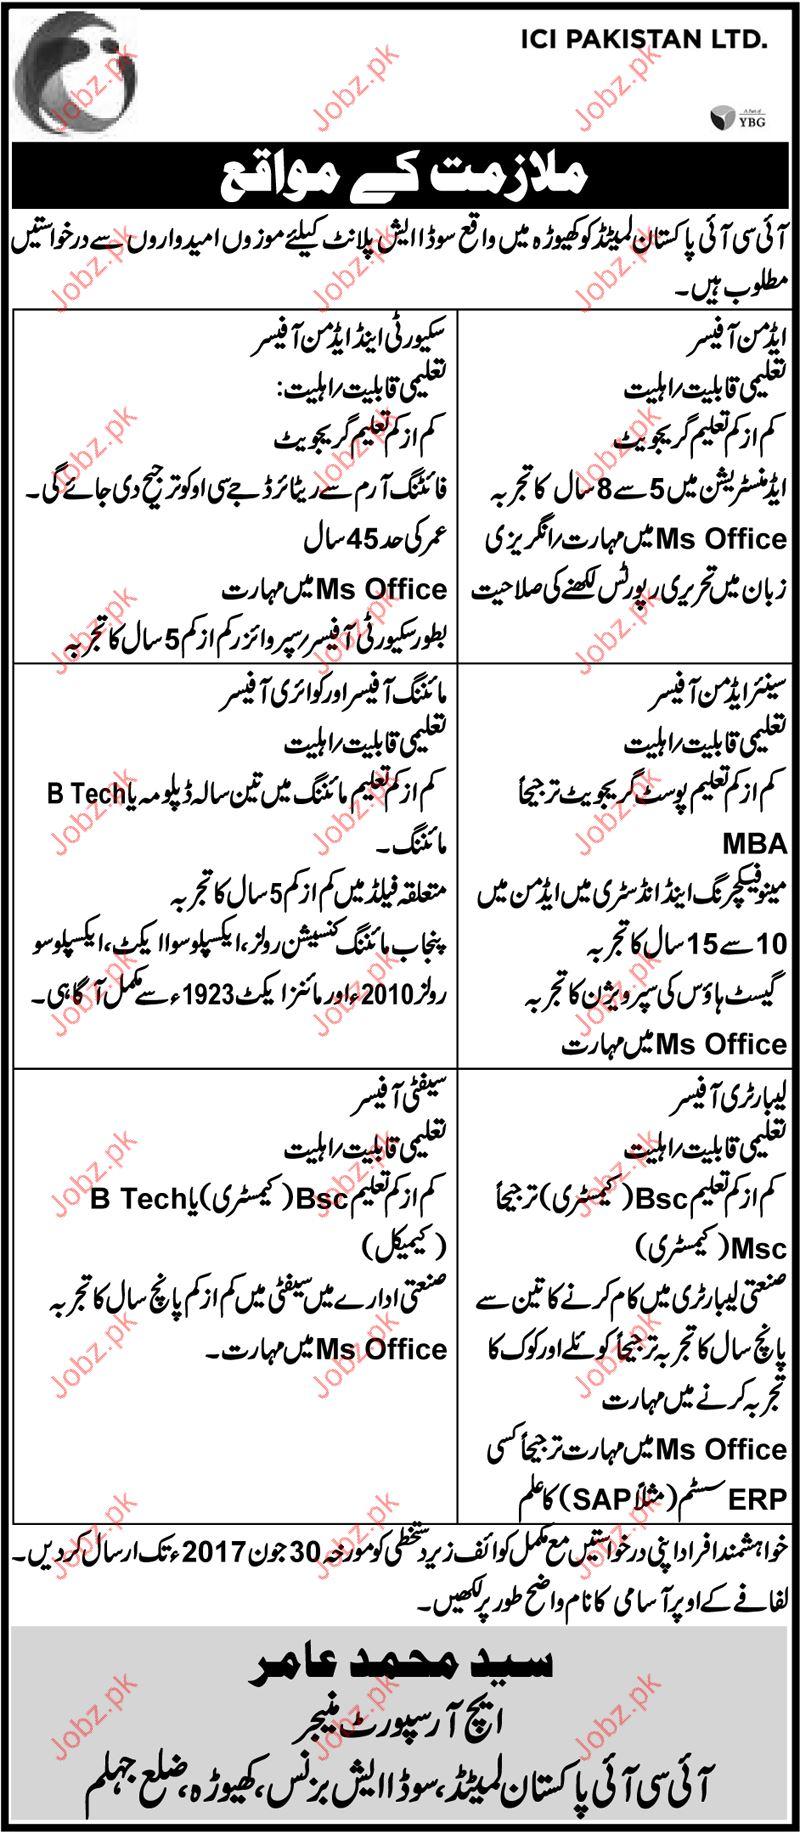 ICI Pakistan Ltd Job Opportunities